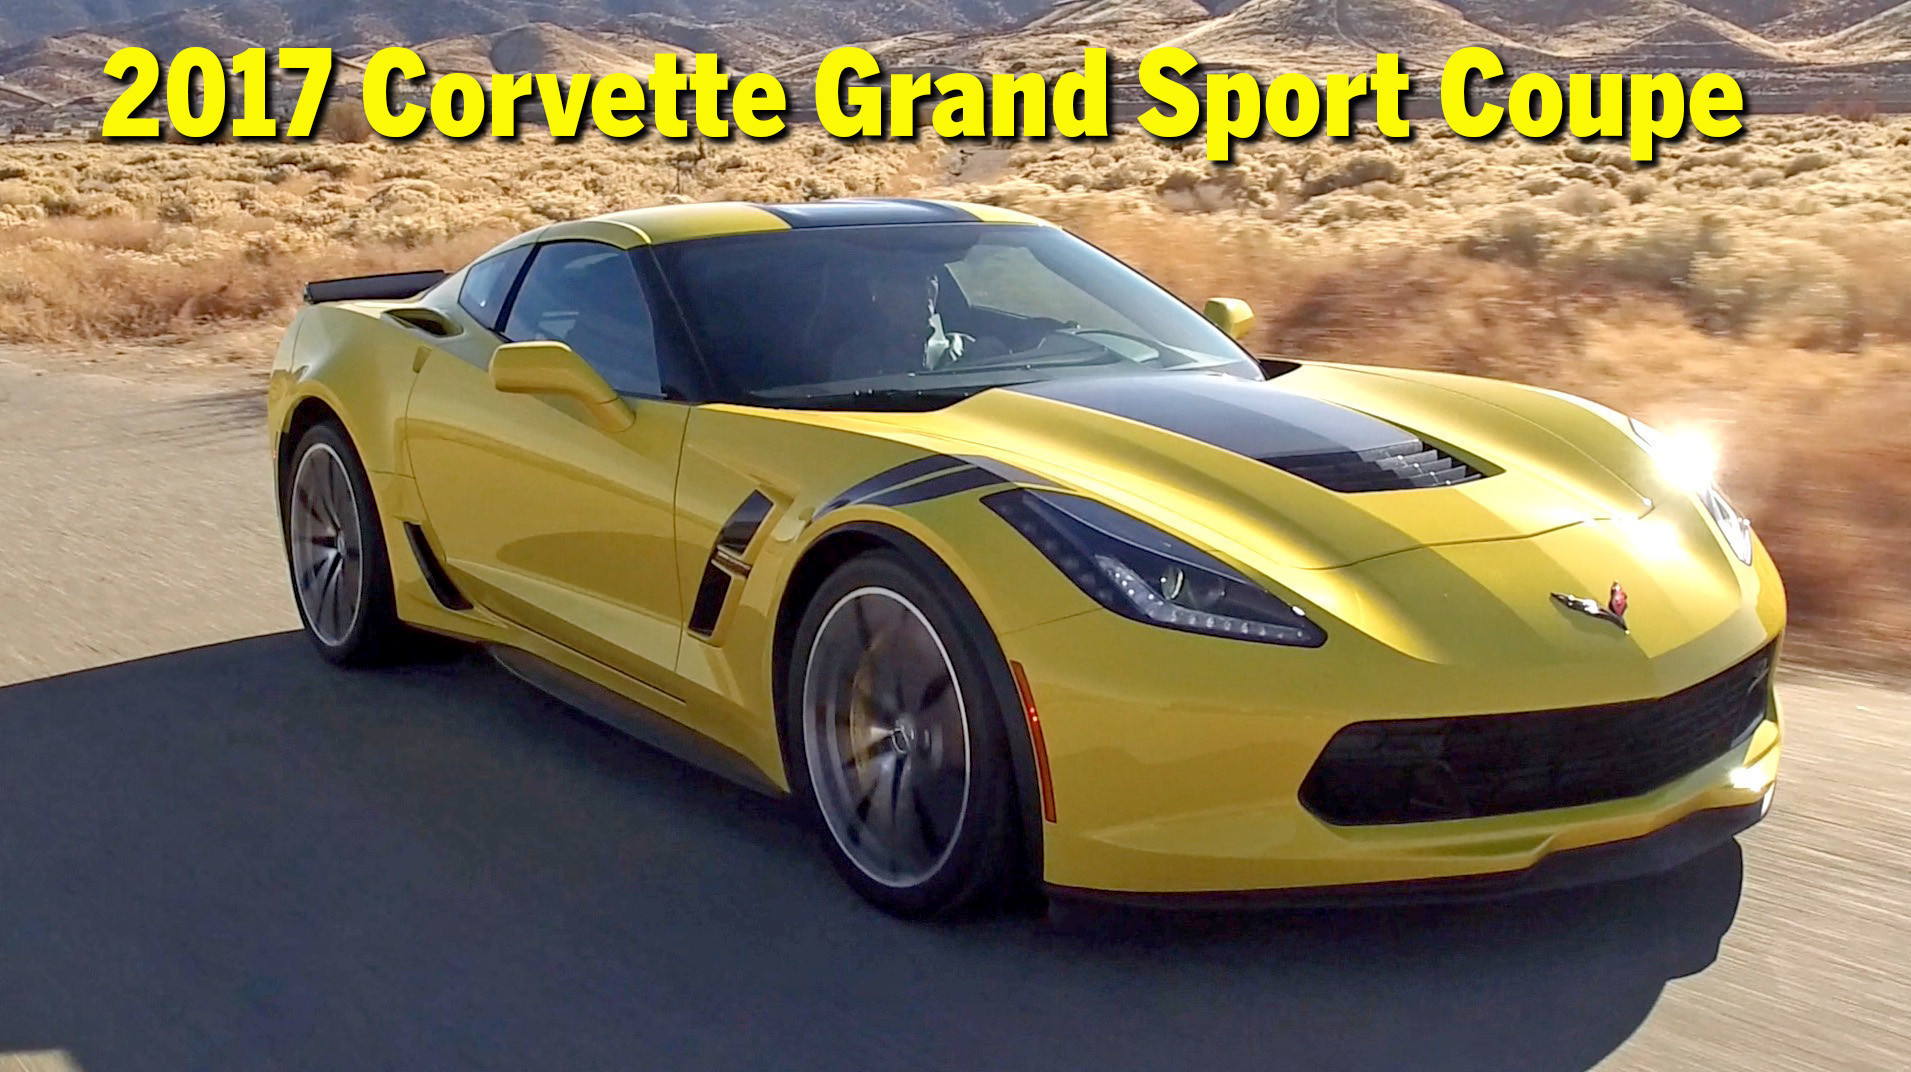 2017 corvette grand sport coupe. Black Bedroom Furniture Sets. Home Design Ideas